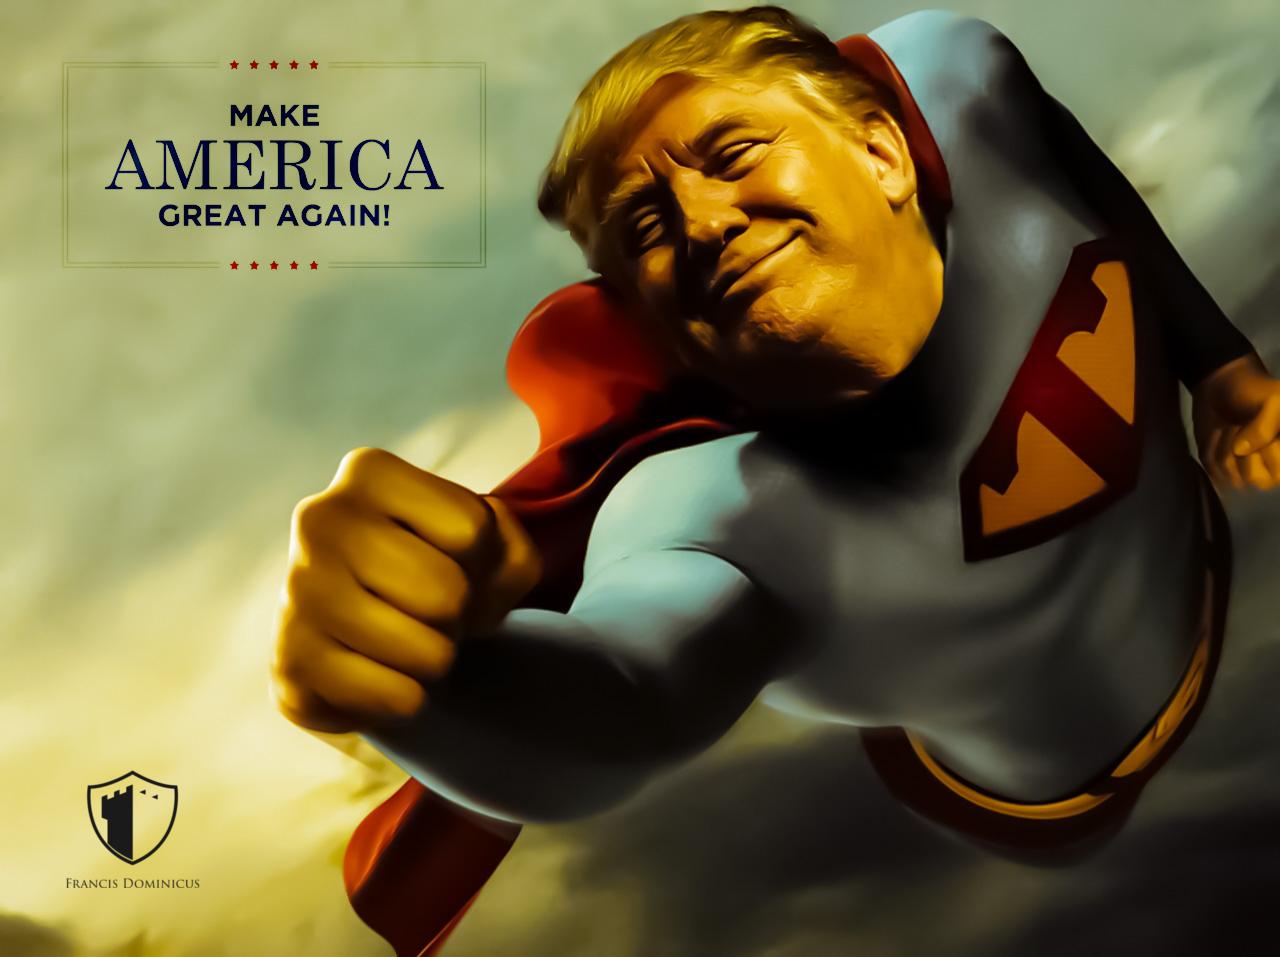 Make america great again donald trump know your meme for Make america great again wallpaper